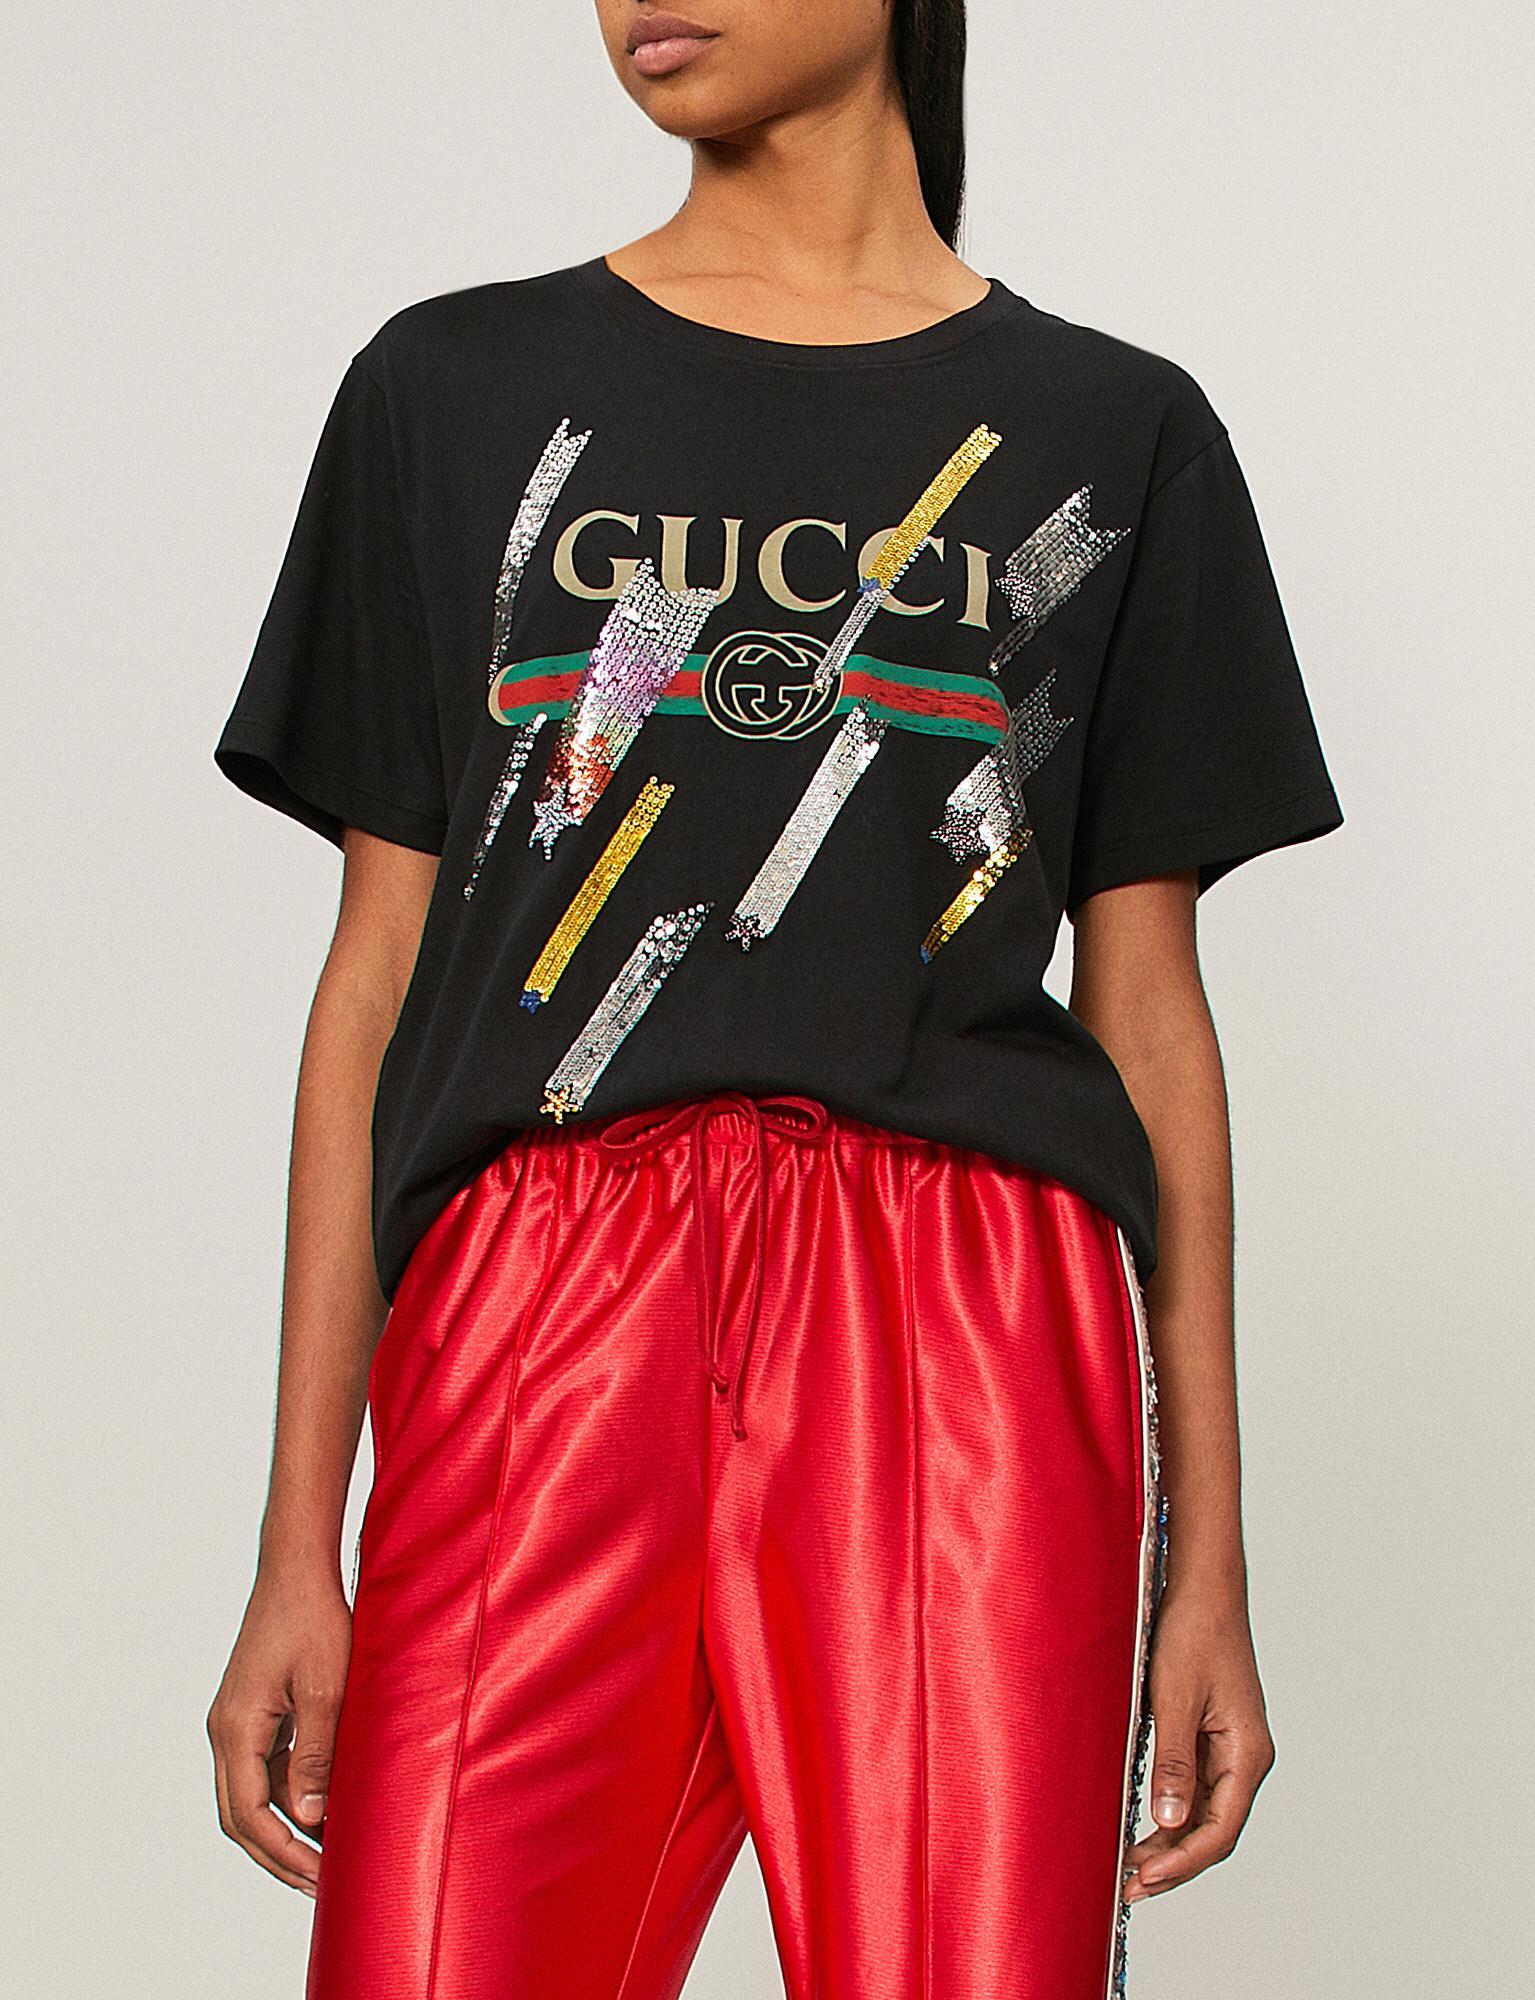 9228f5a1b75 Vintage Gucci T Shirt Australia